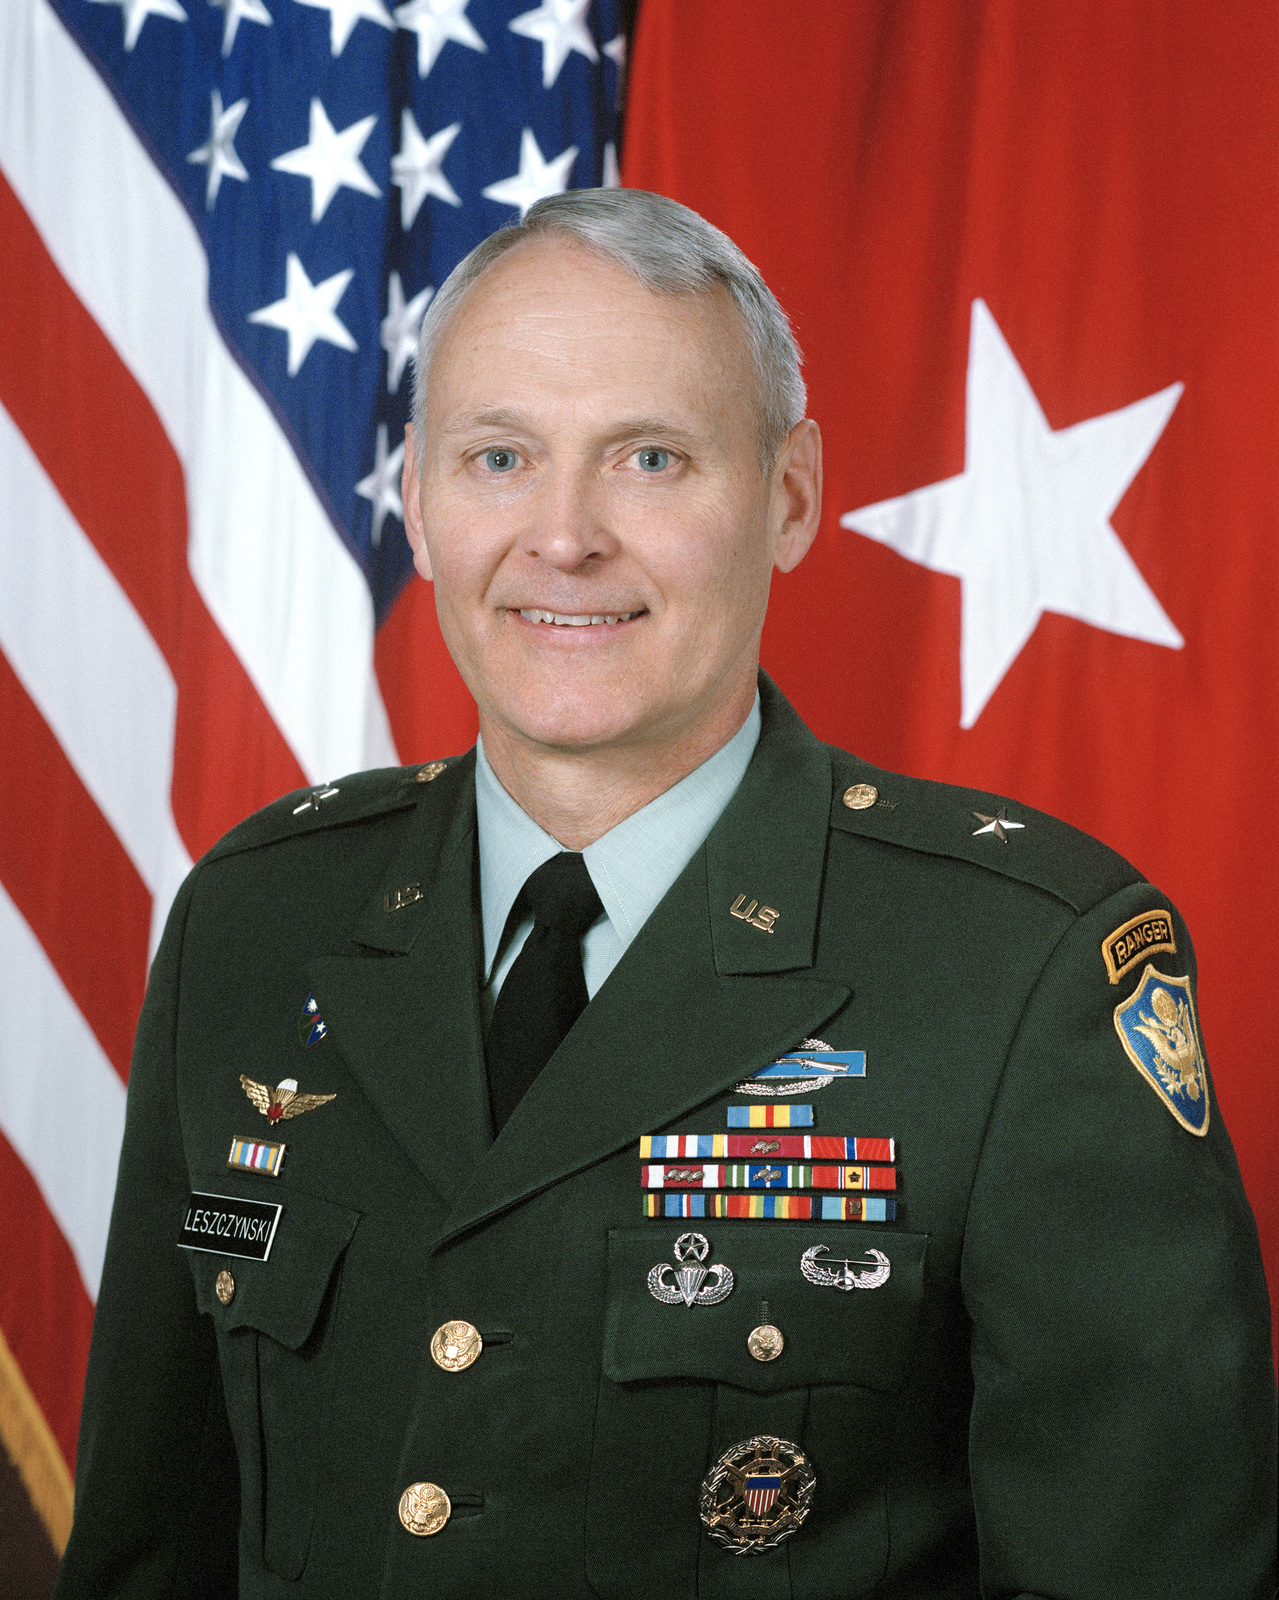 Portrait of U S  Army Brig  Gen  William J  Leszynski, Jr